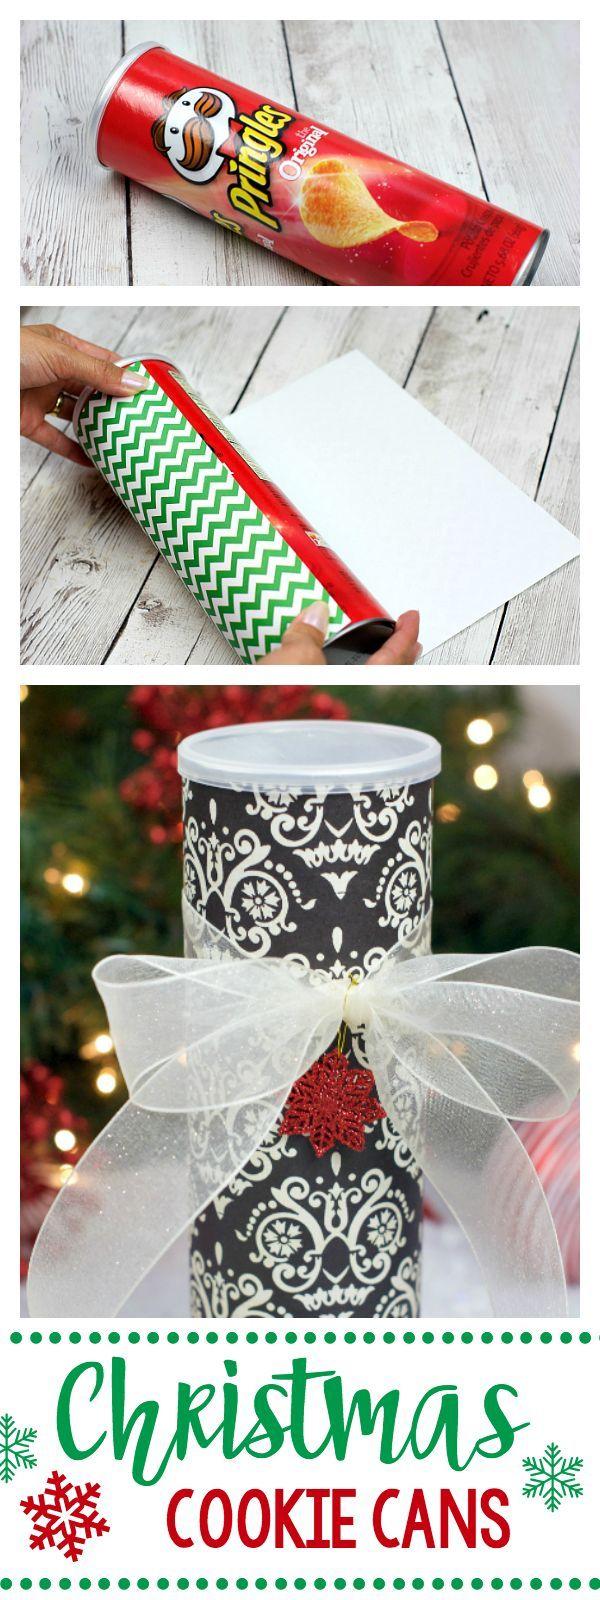 Fun Creative Christmas Cookie Containers Manualidades Para  ~ Regalos Originales Para Navidad Manualidades